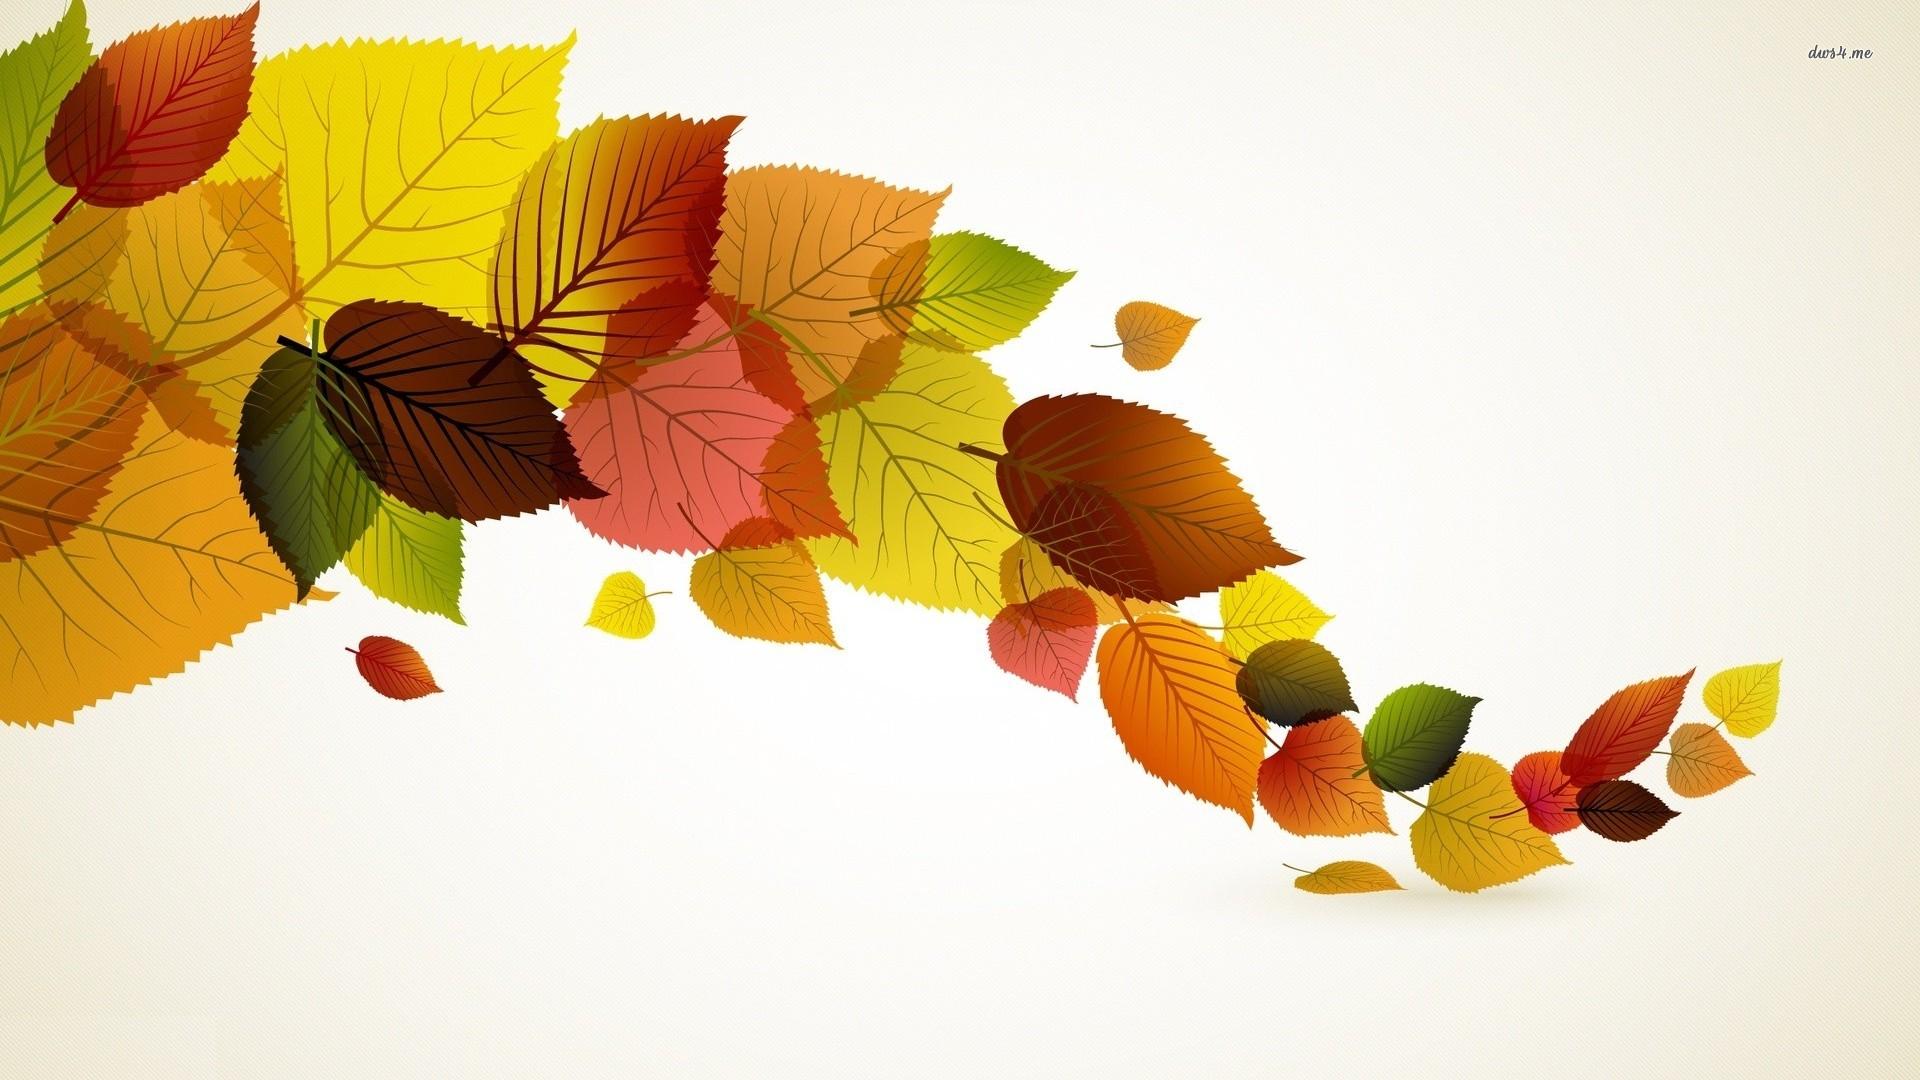 1920x1080 Fall Leaves Vector Hd Desktop Wallpaper, Instagram Photo